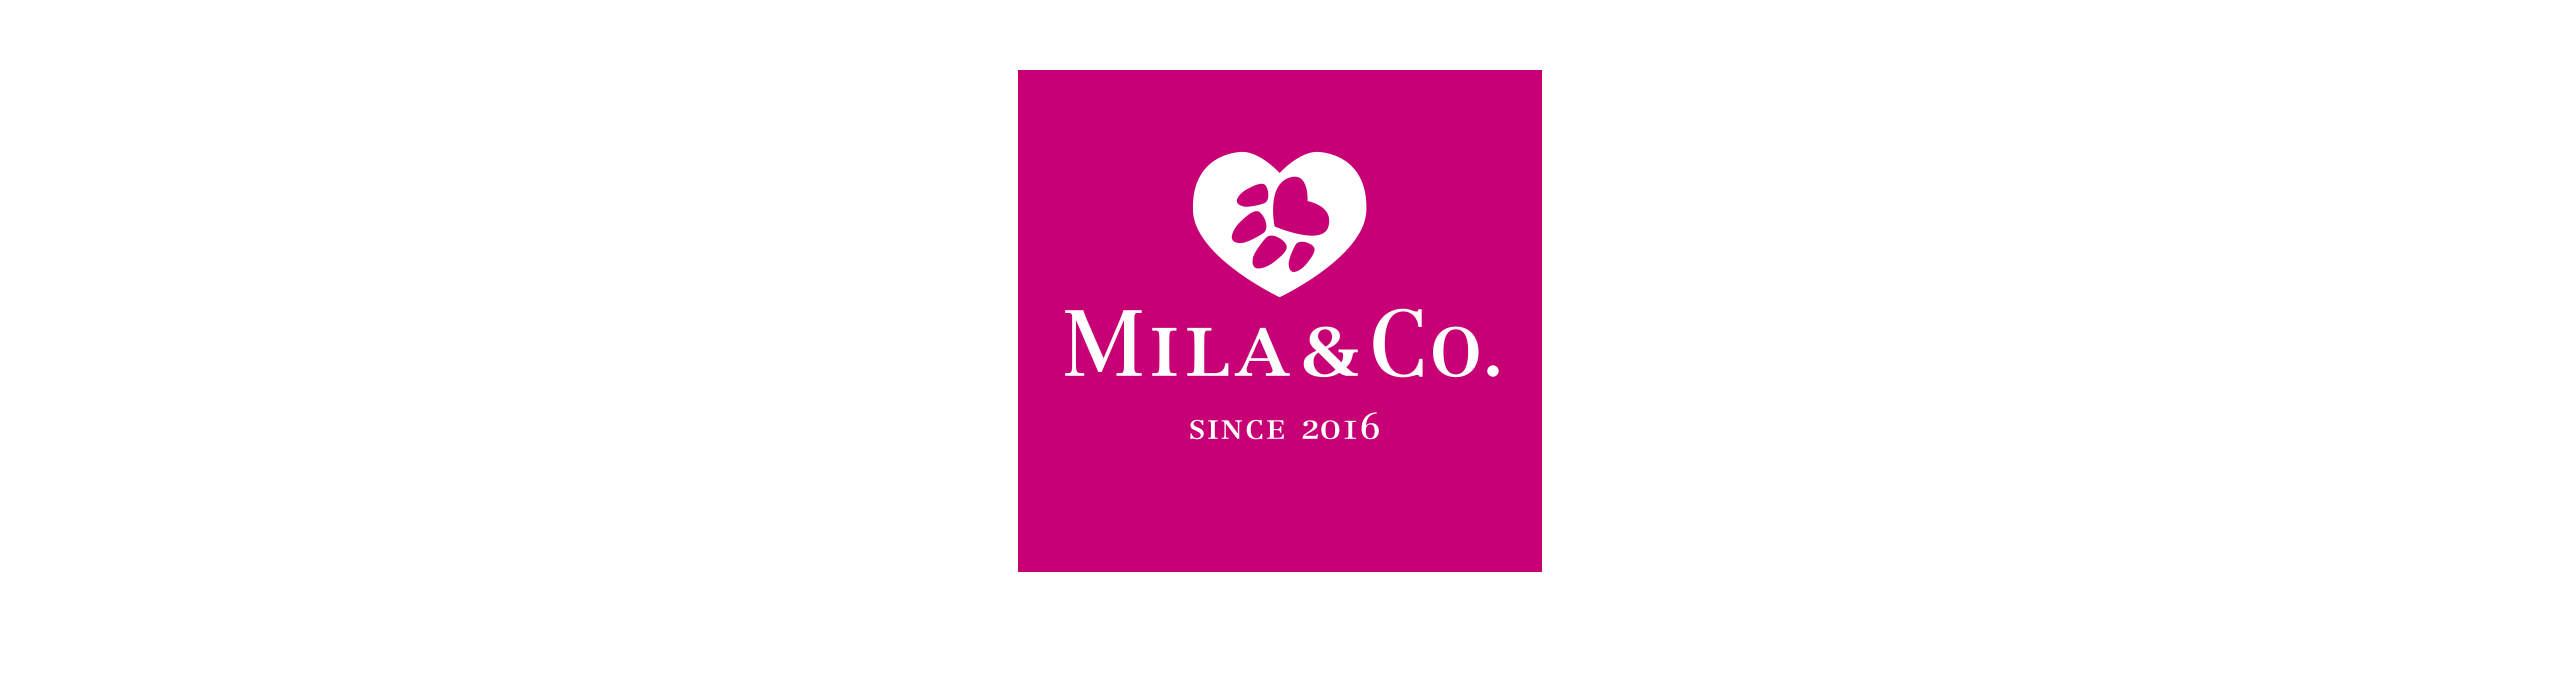 milaandco_logo